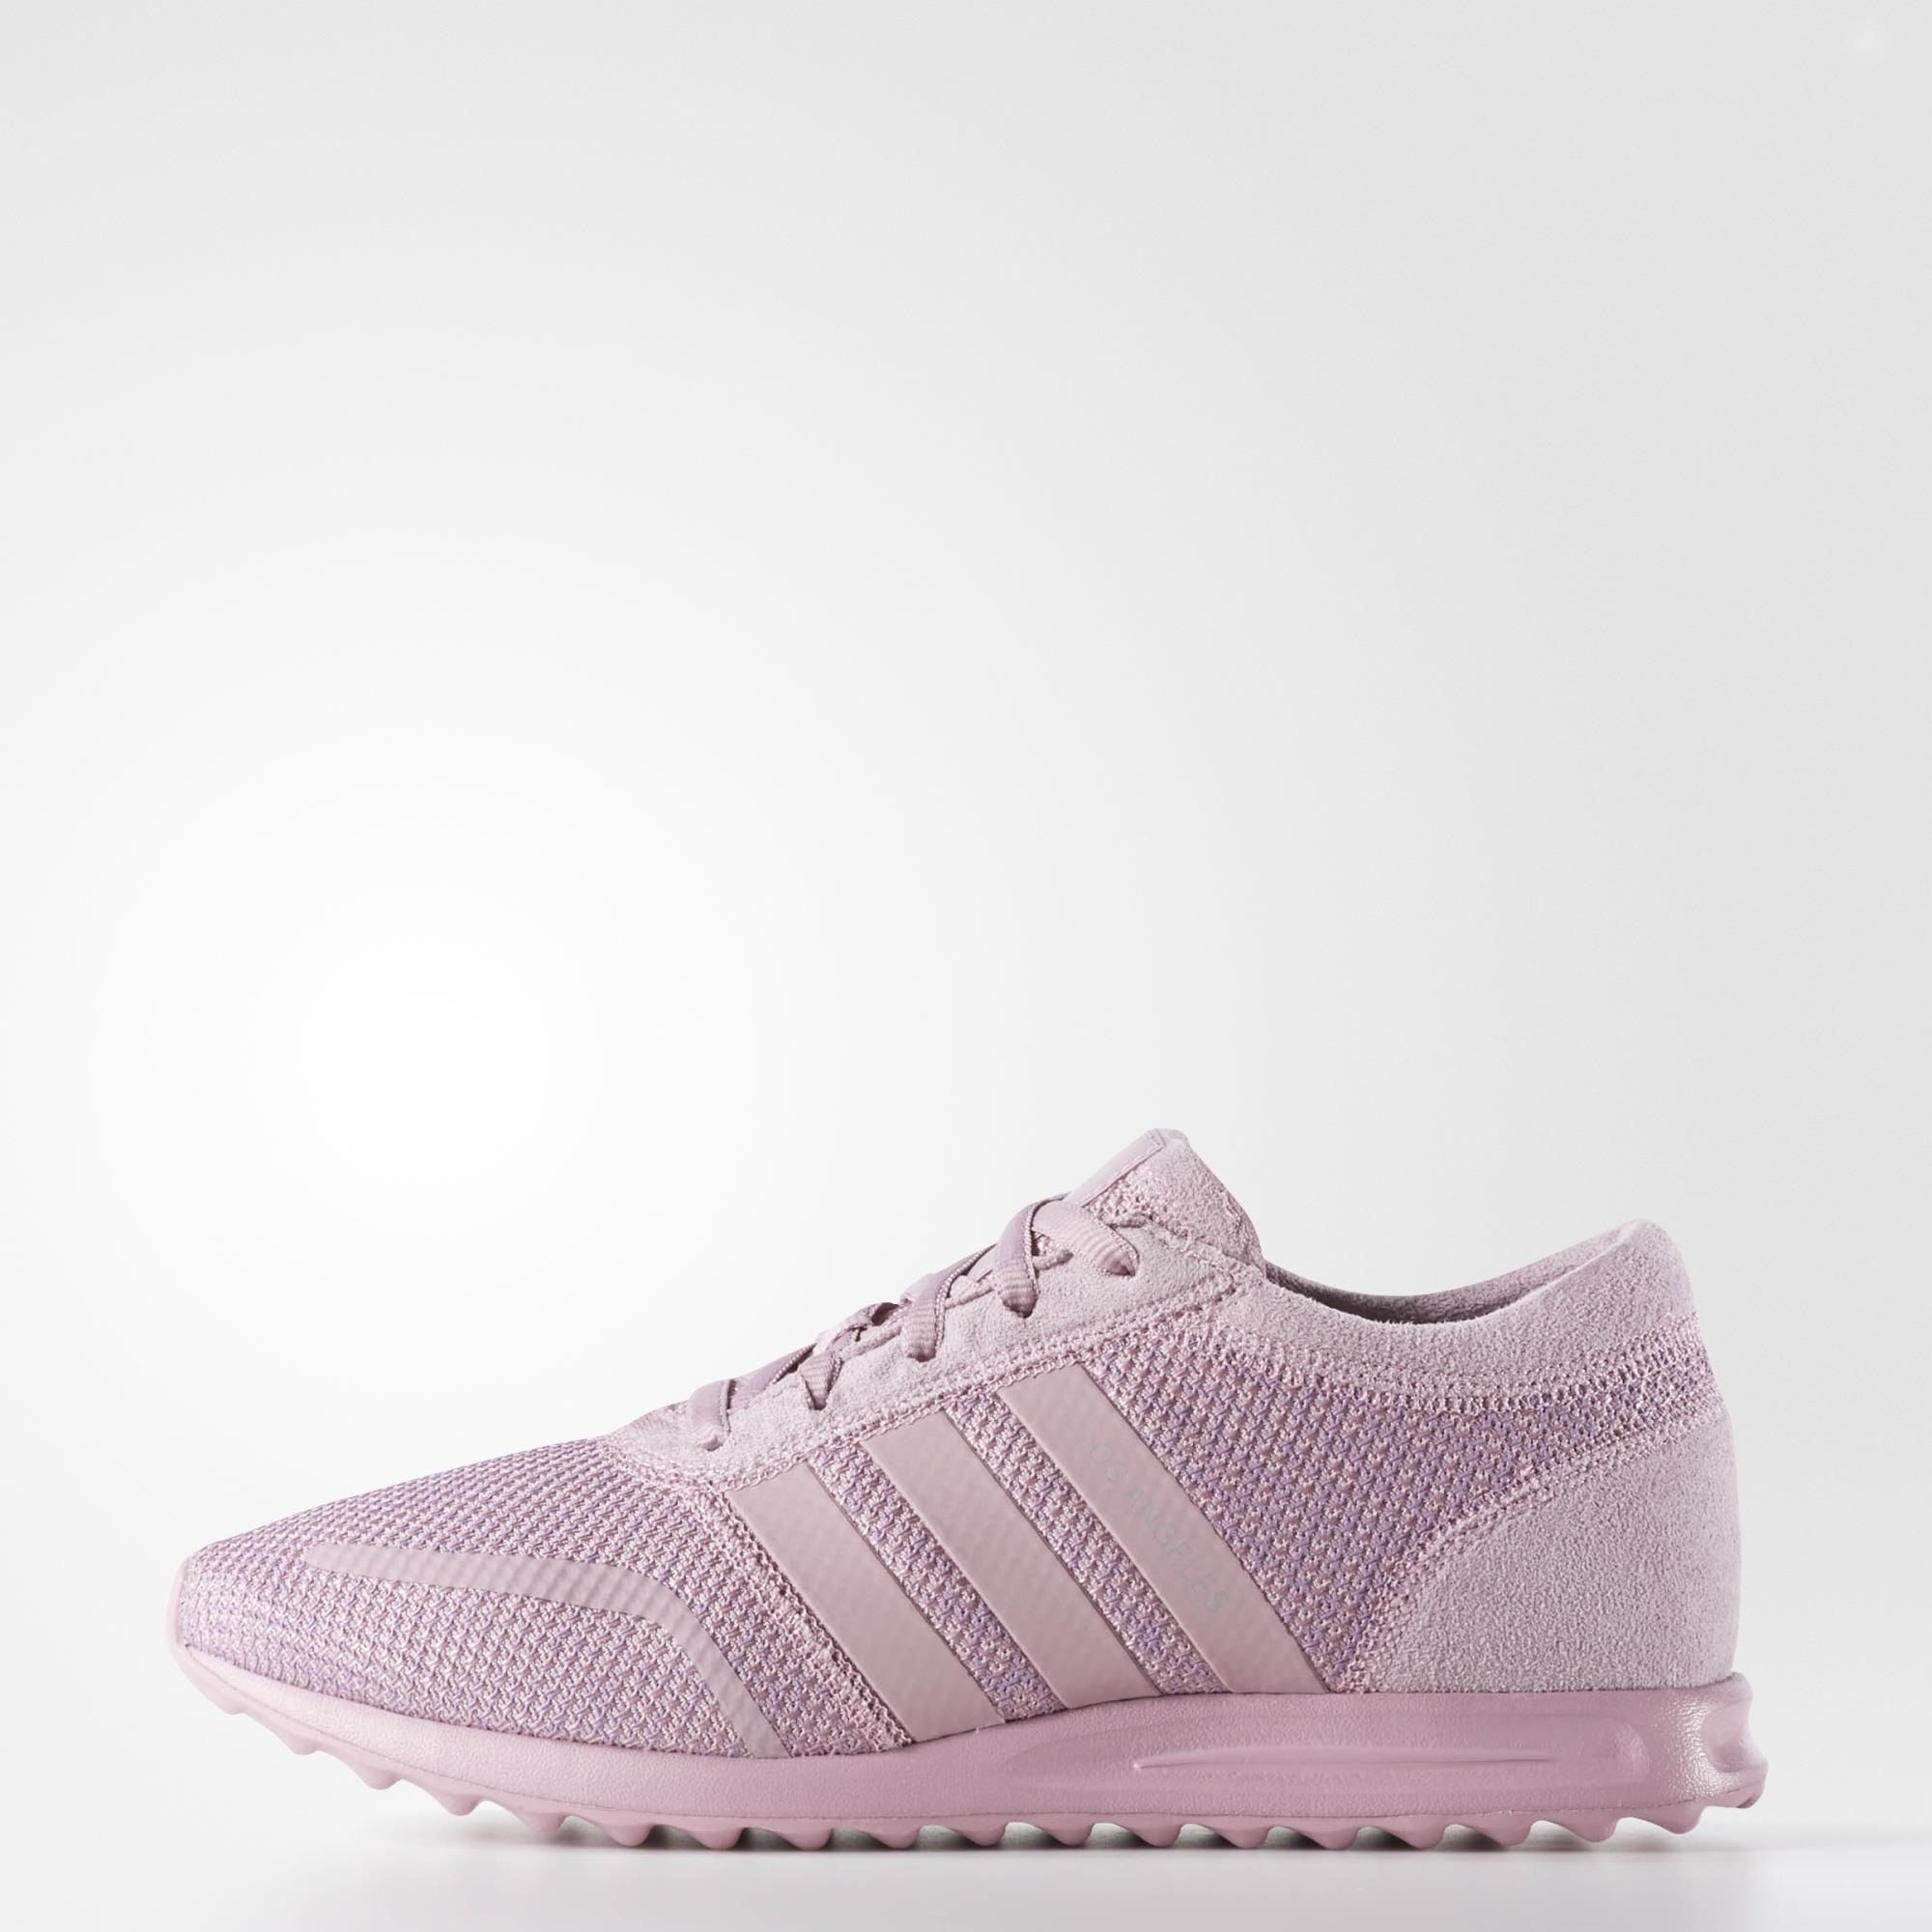 Adidas Los Angeles Scarpe Adidas Unito Scarpe Rosa F Spostamento